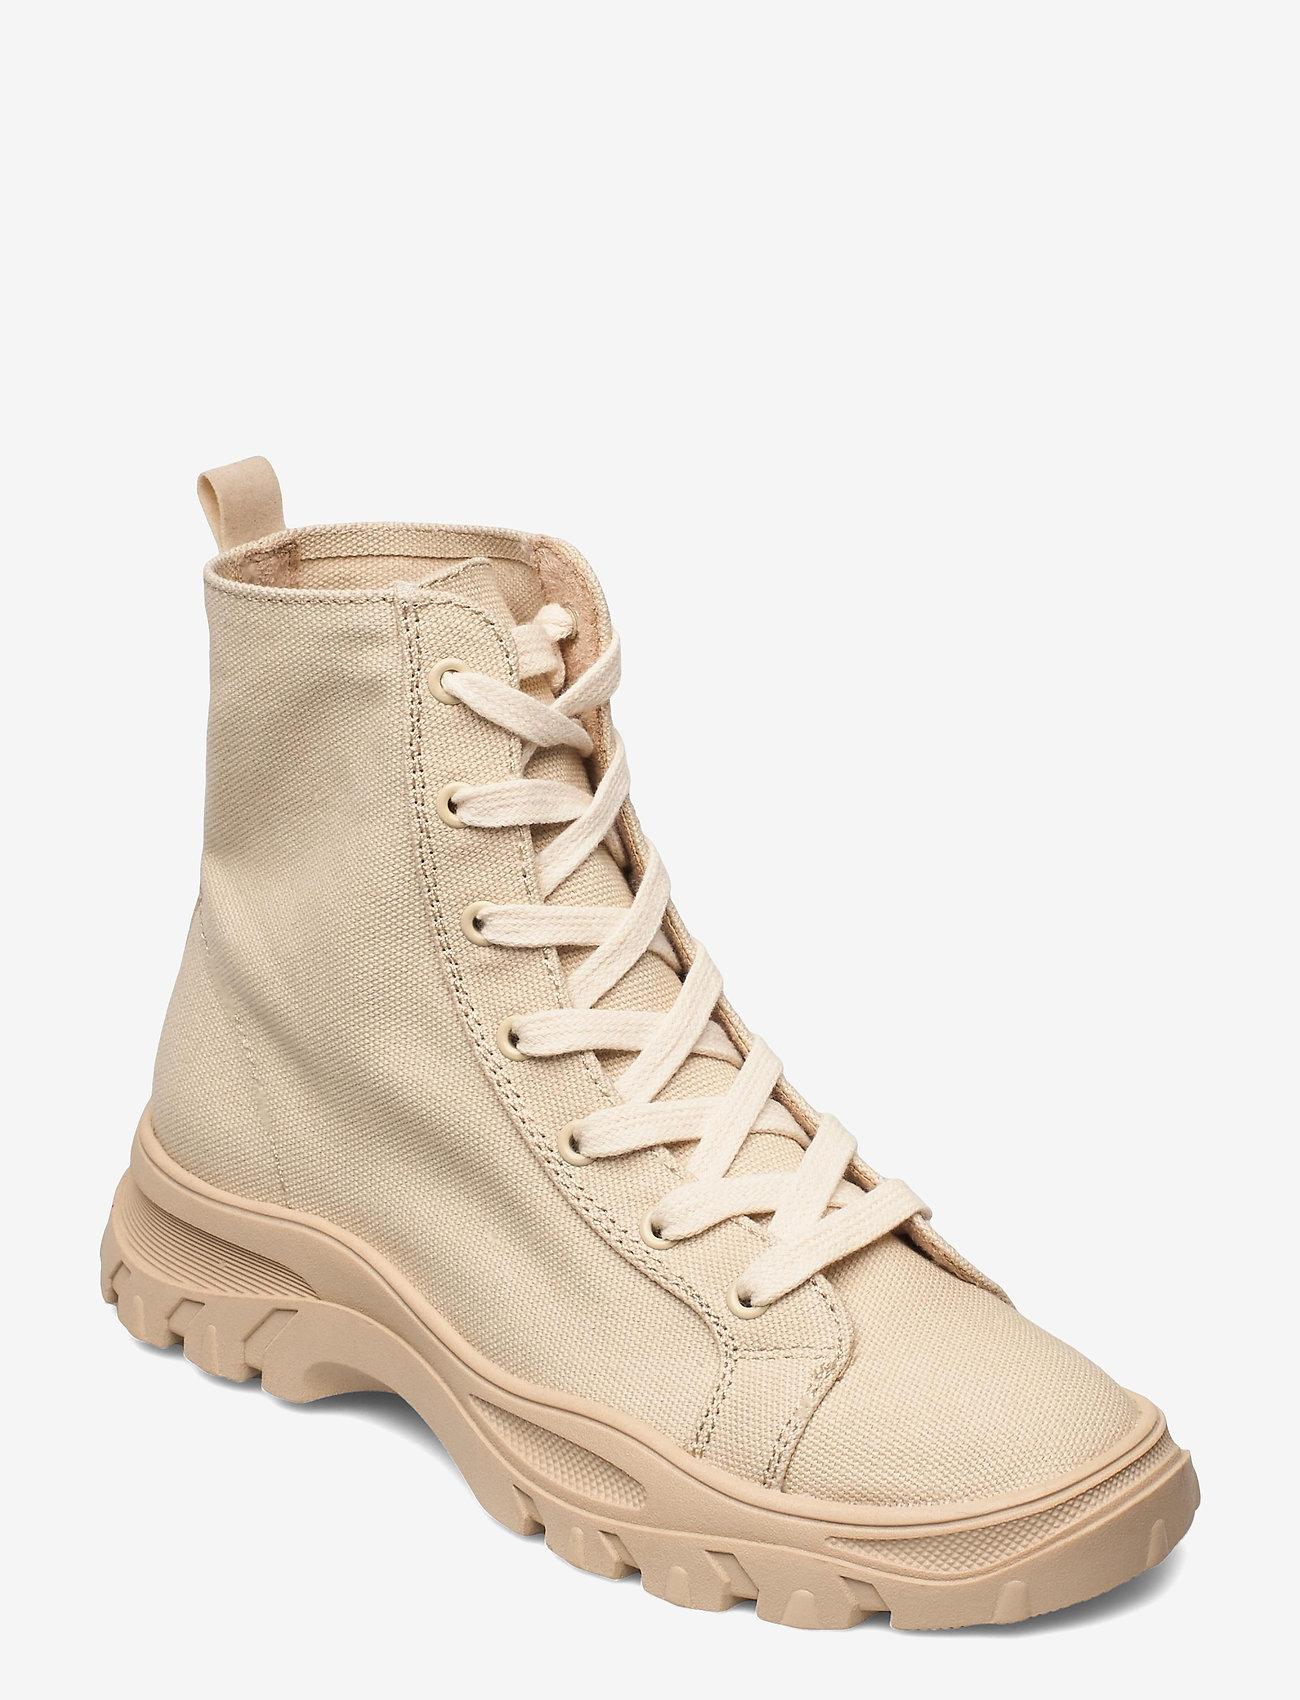 Vero Moda - VMMALIA HIGHTOP SNEAKER - chunky sneakers - silver mink - 0